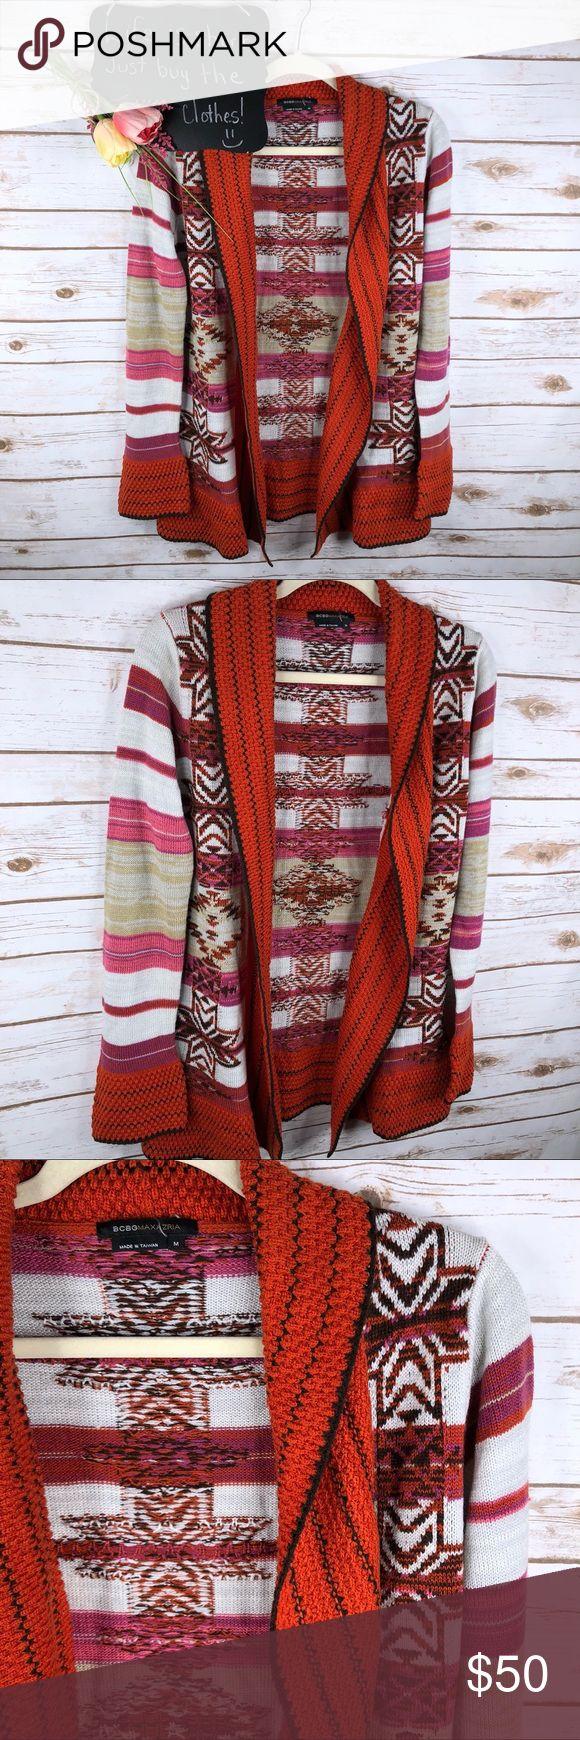 BCBGMaxazria tribal print chunky open front cardi